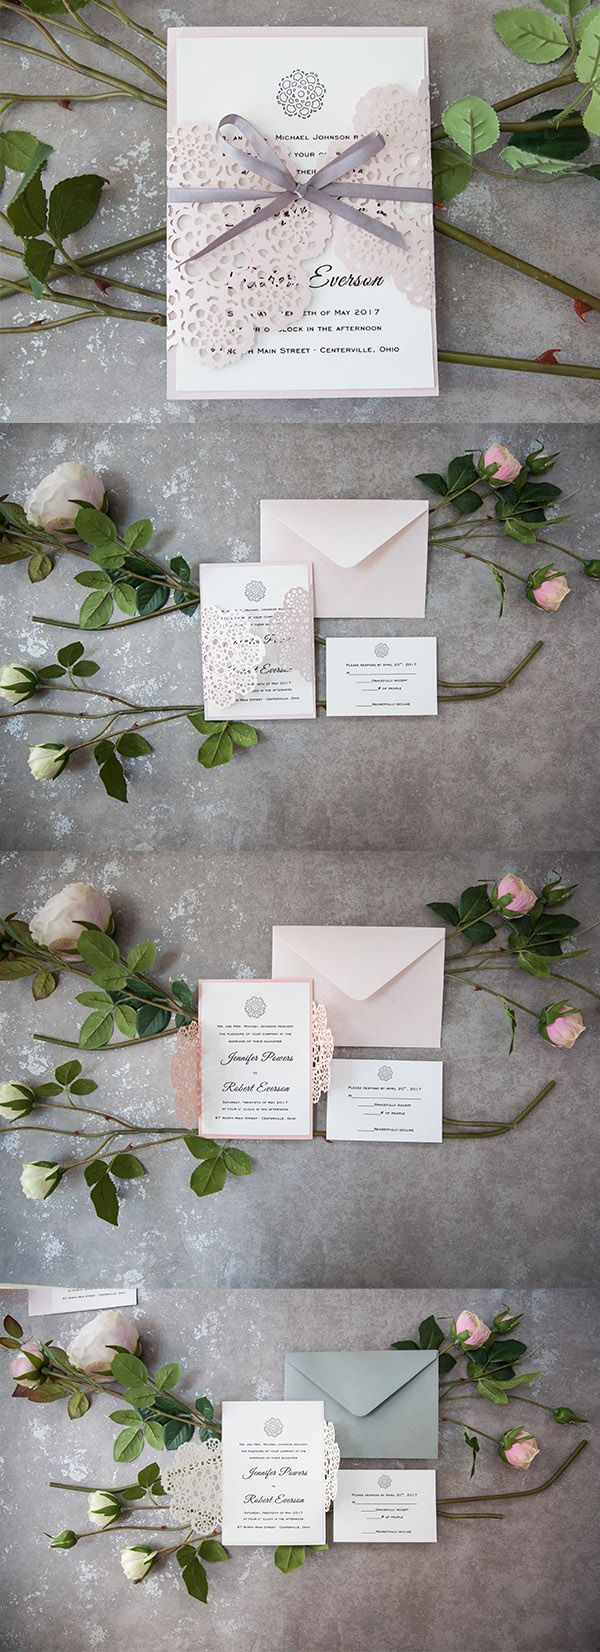 289 Best Undangan Images On Pinterest Bridal Invitations